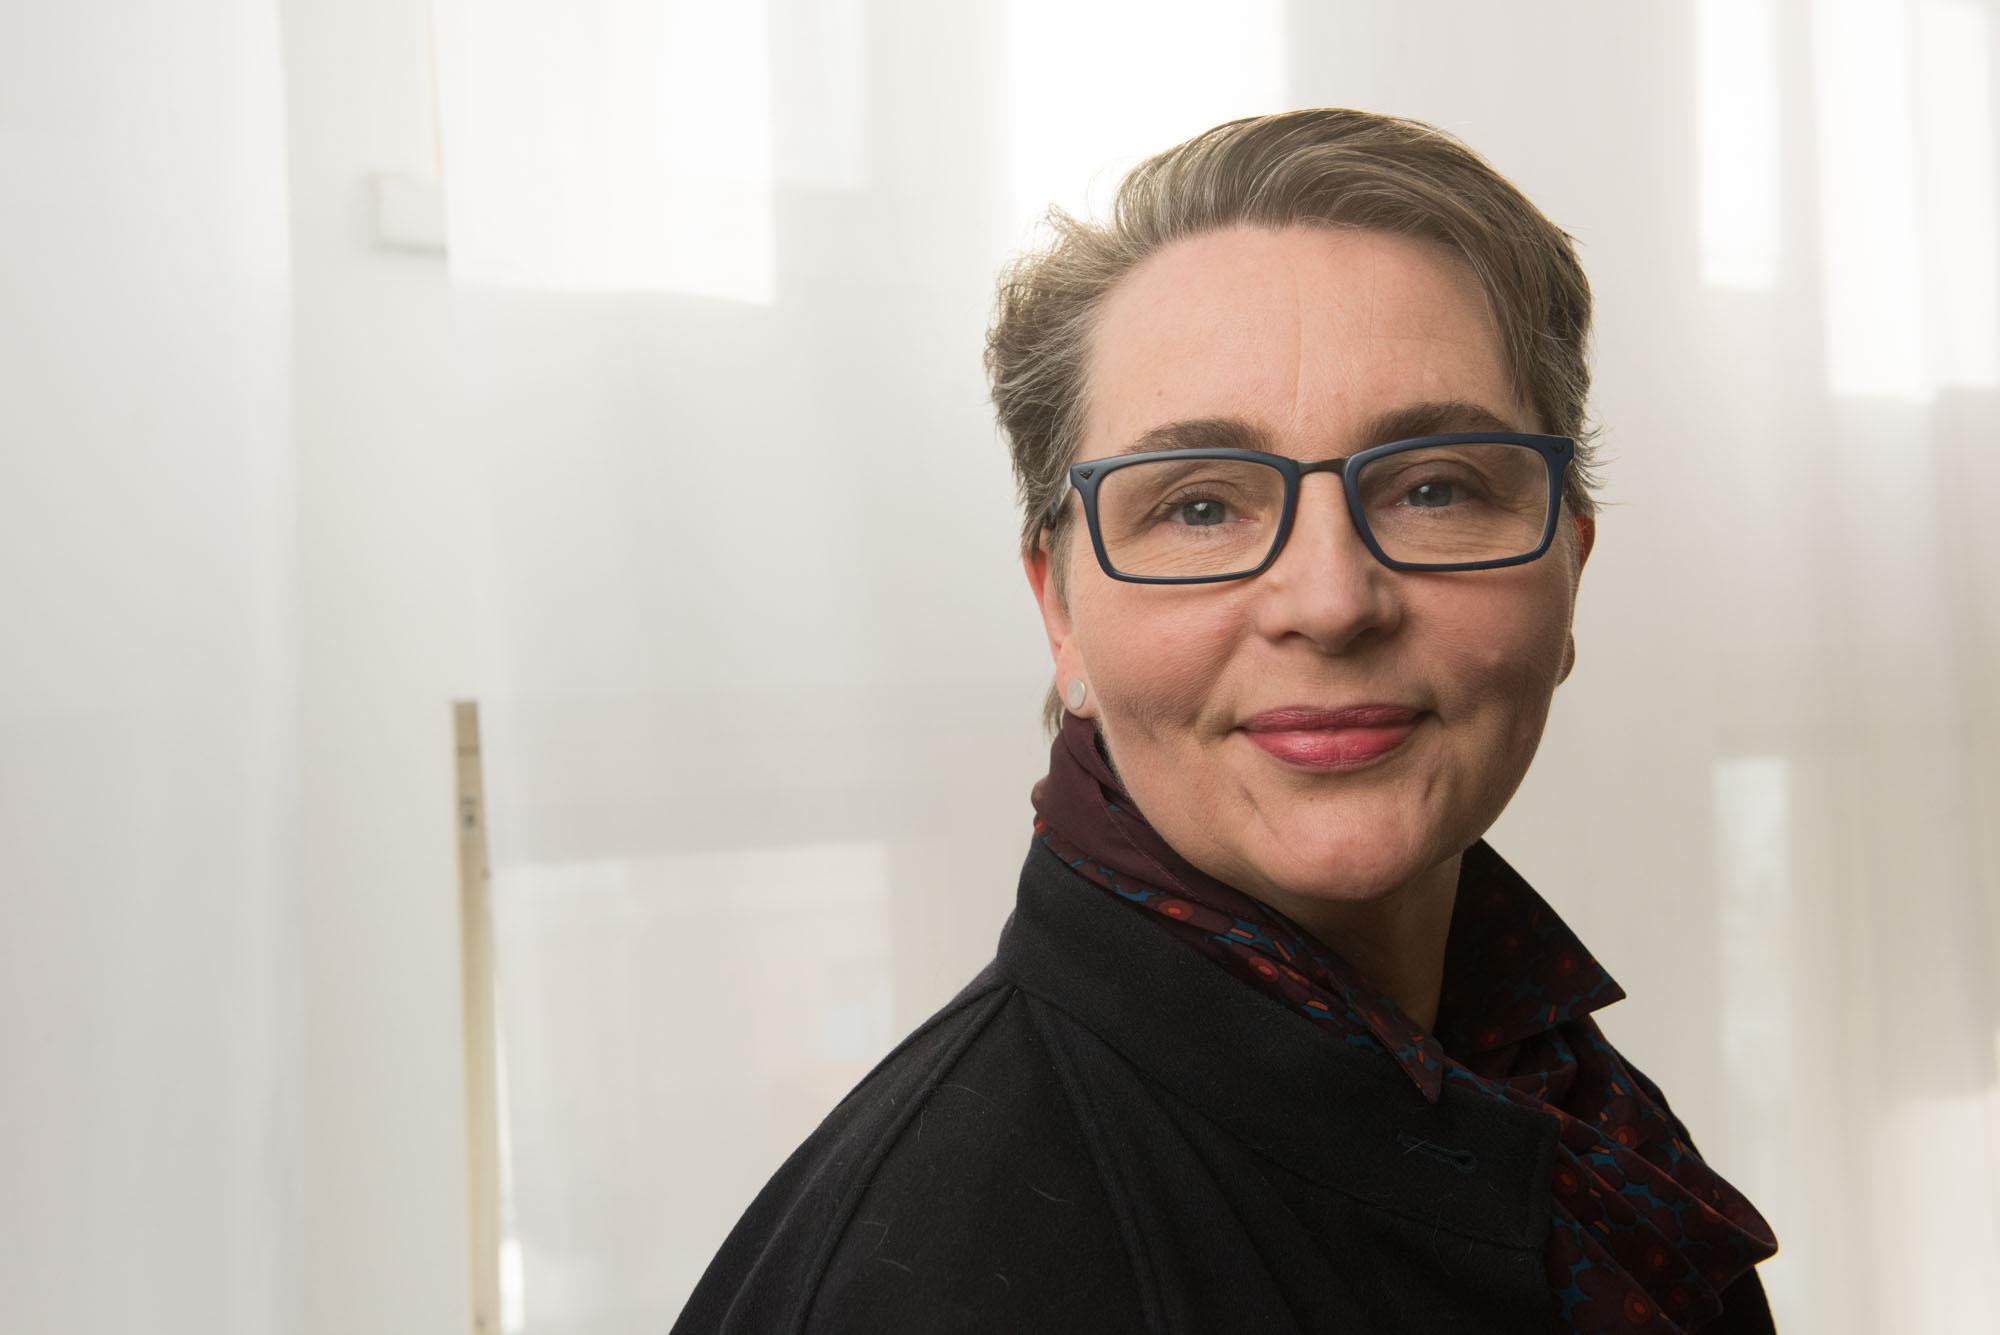 Leena Svinhufvud Weaving Theory – Feminine Craft to Mode of Design